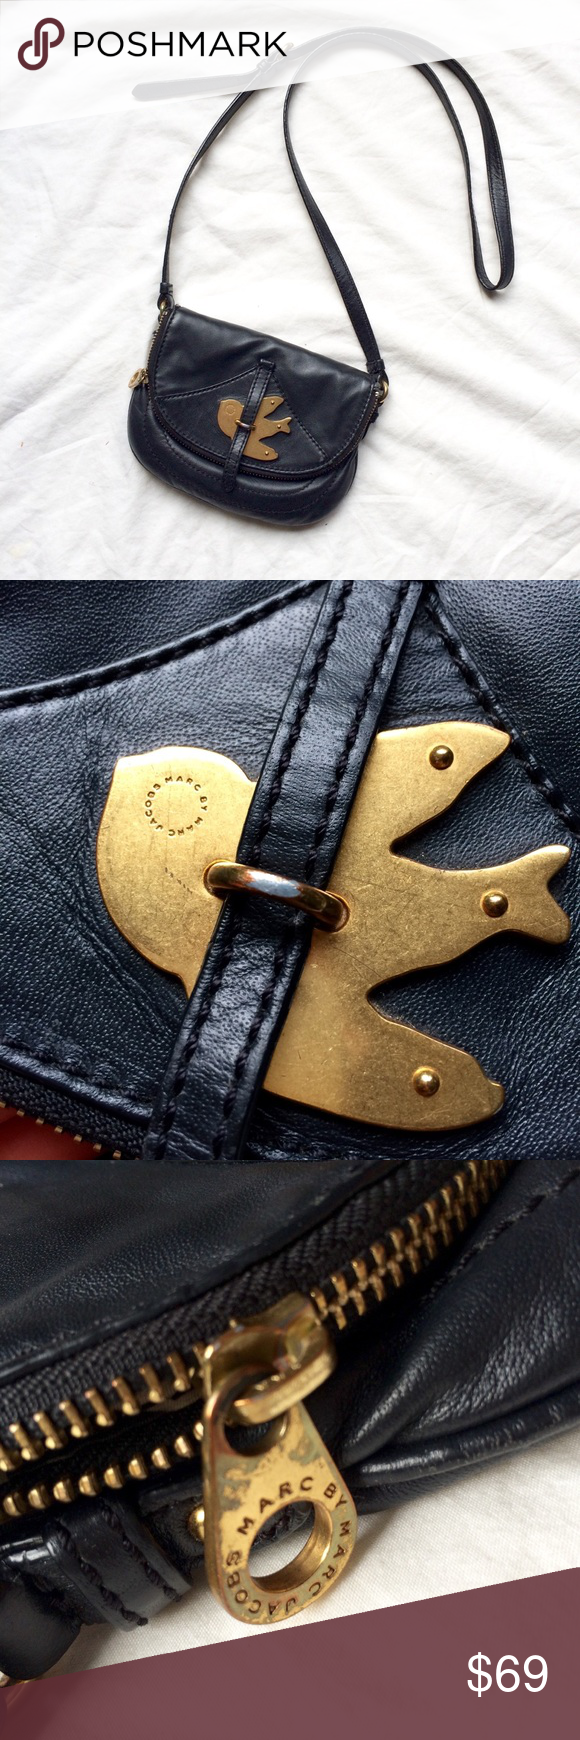 Hp Mbmj Petal To The Metal Crossbody Marc Jacobs Logo Marc Jacobs Bag Crossbody Bag